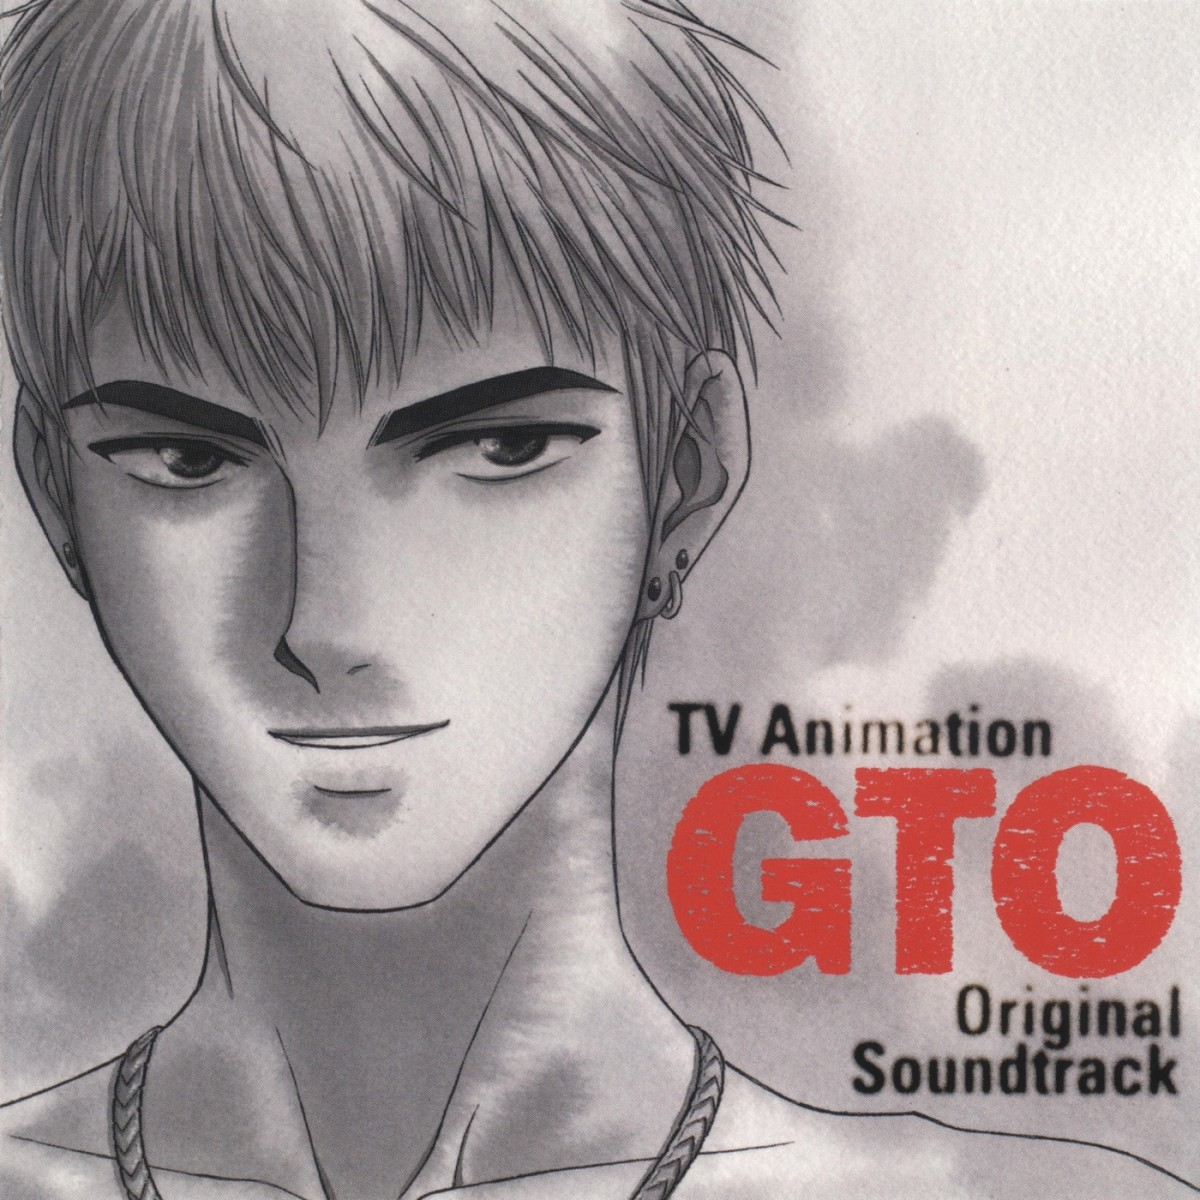 Great Teacher Onizuka GTO Anime Opening Amp Ending Theme Songs With Lyrics HubPages